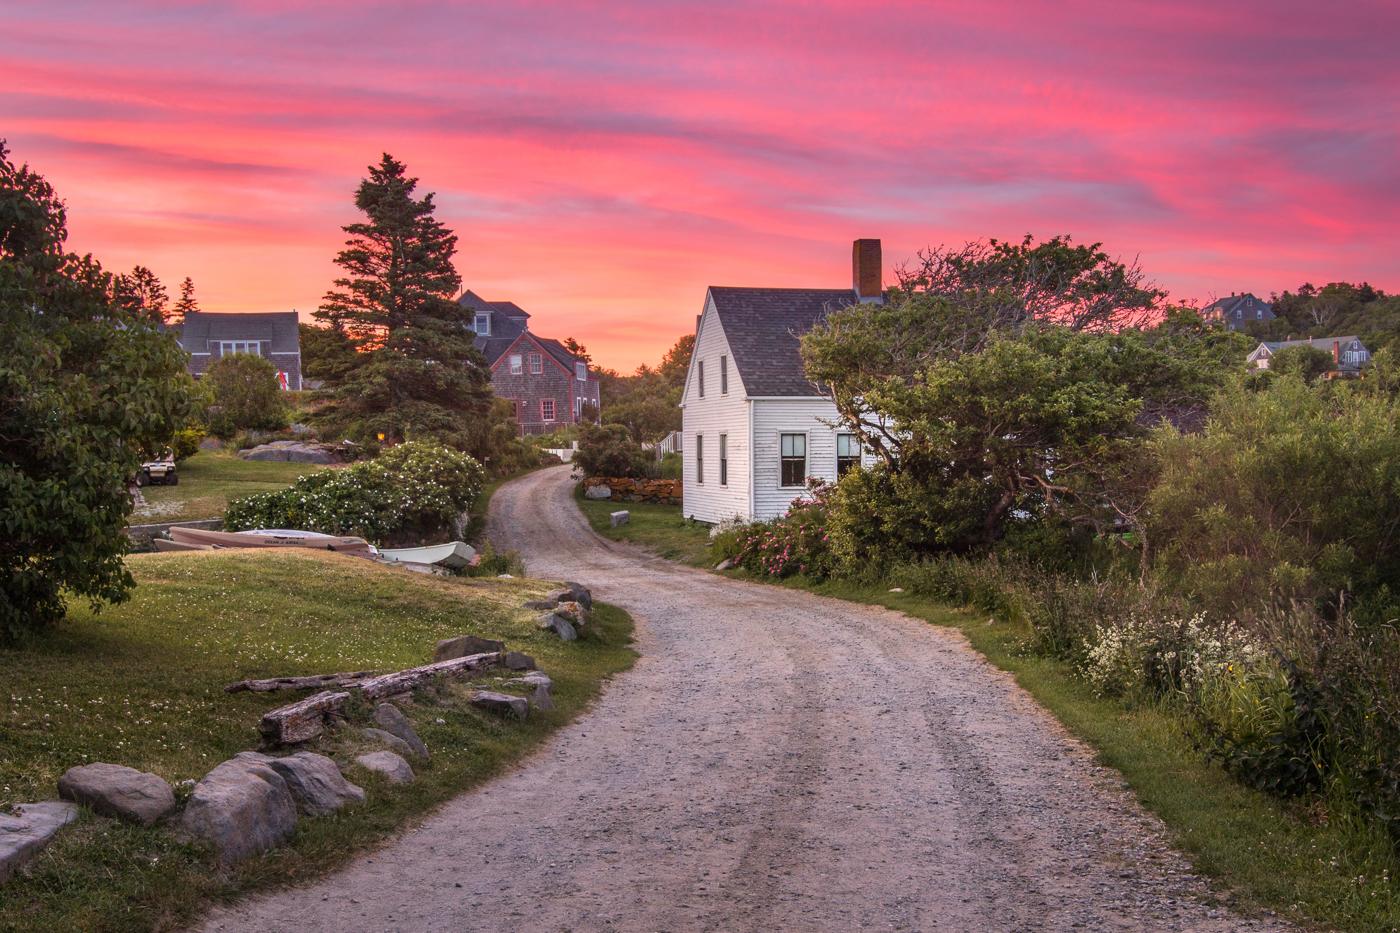 Monhegan Island Maine Photography Workshop | Nature and Landscape